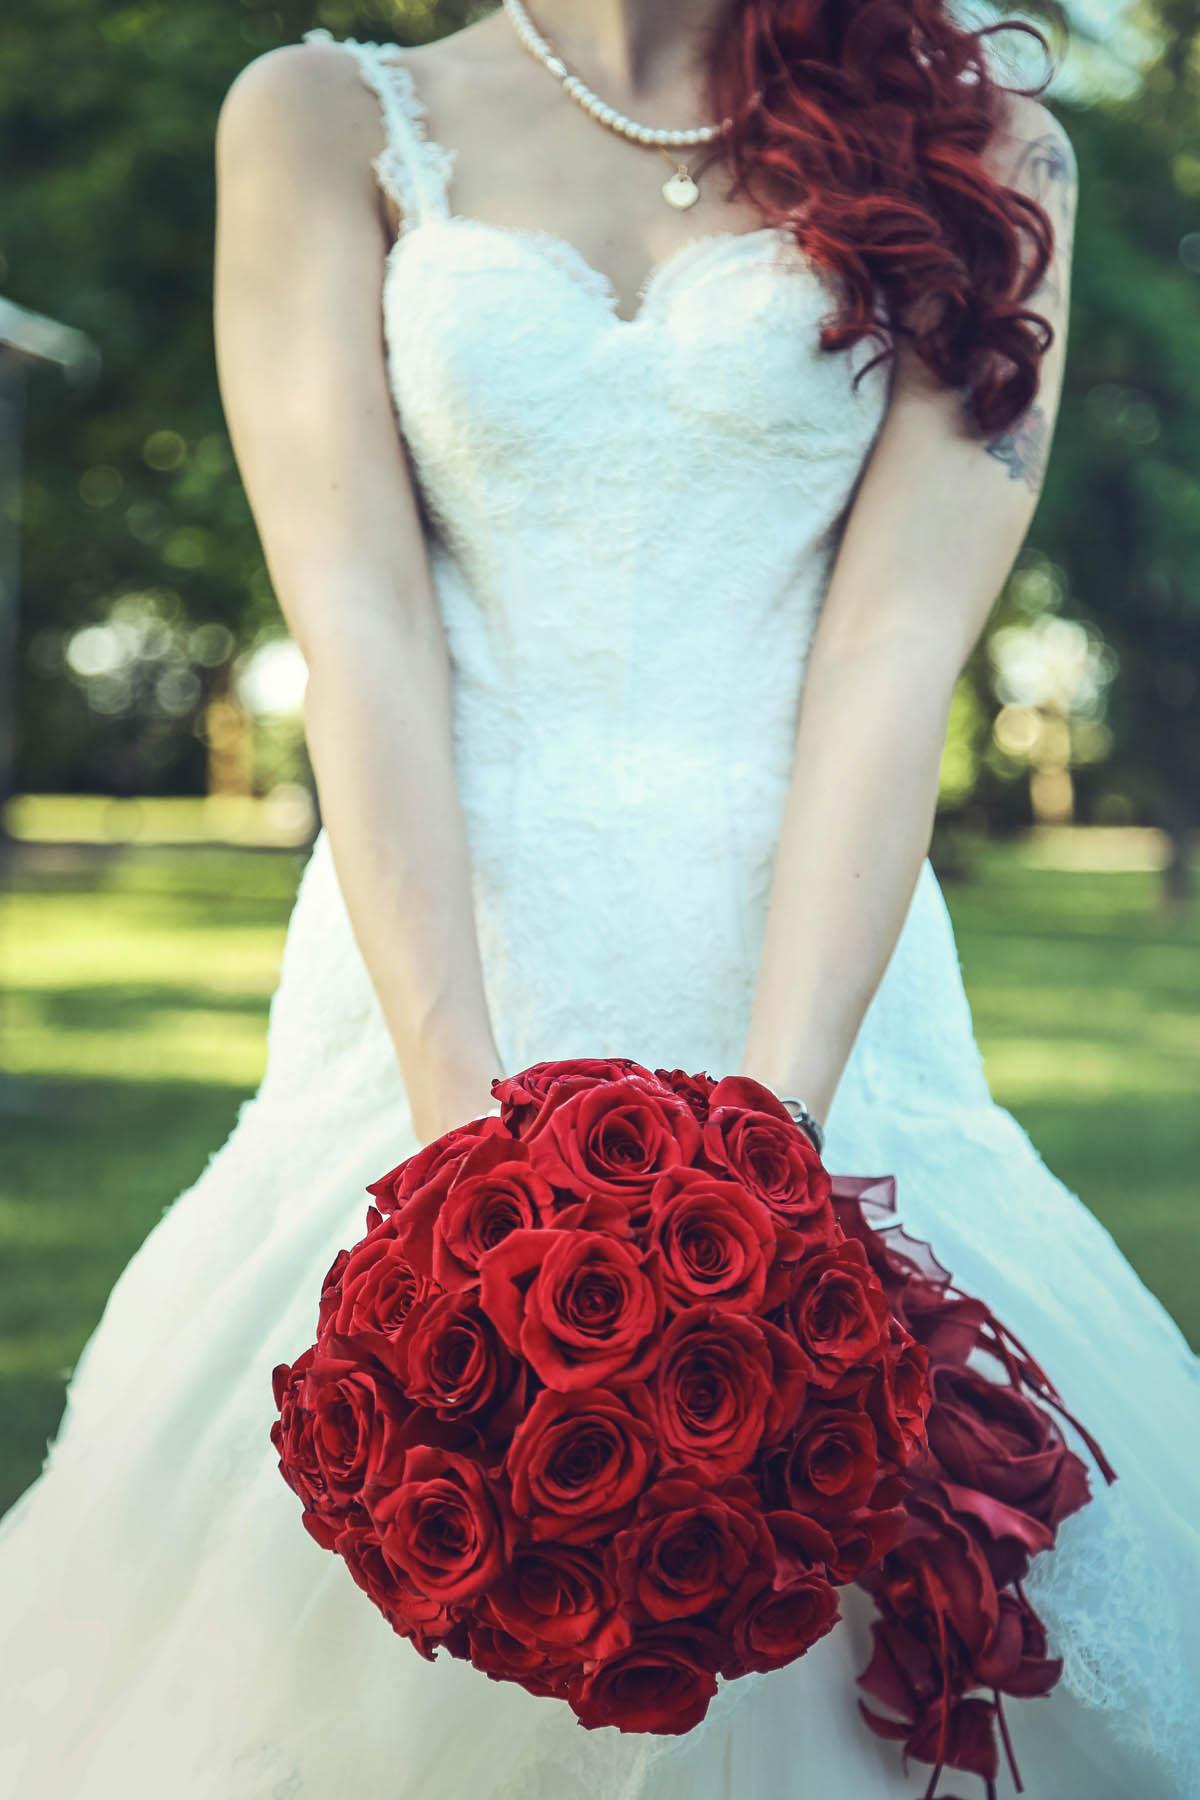 Matrimonio Tema Rosso E Bianco : Un matrimonio a tema fragole e ciliegie wedding wonderland